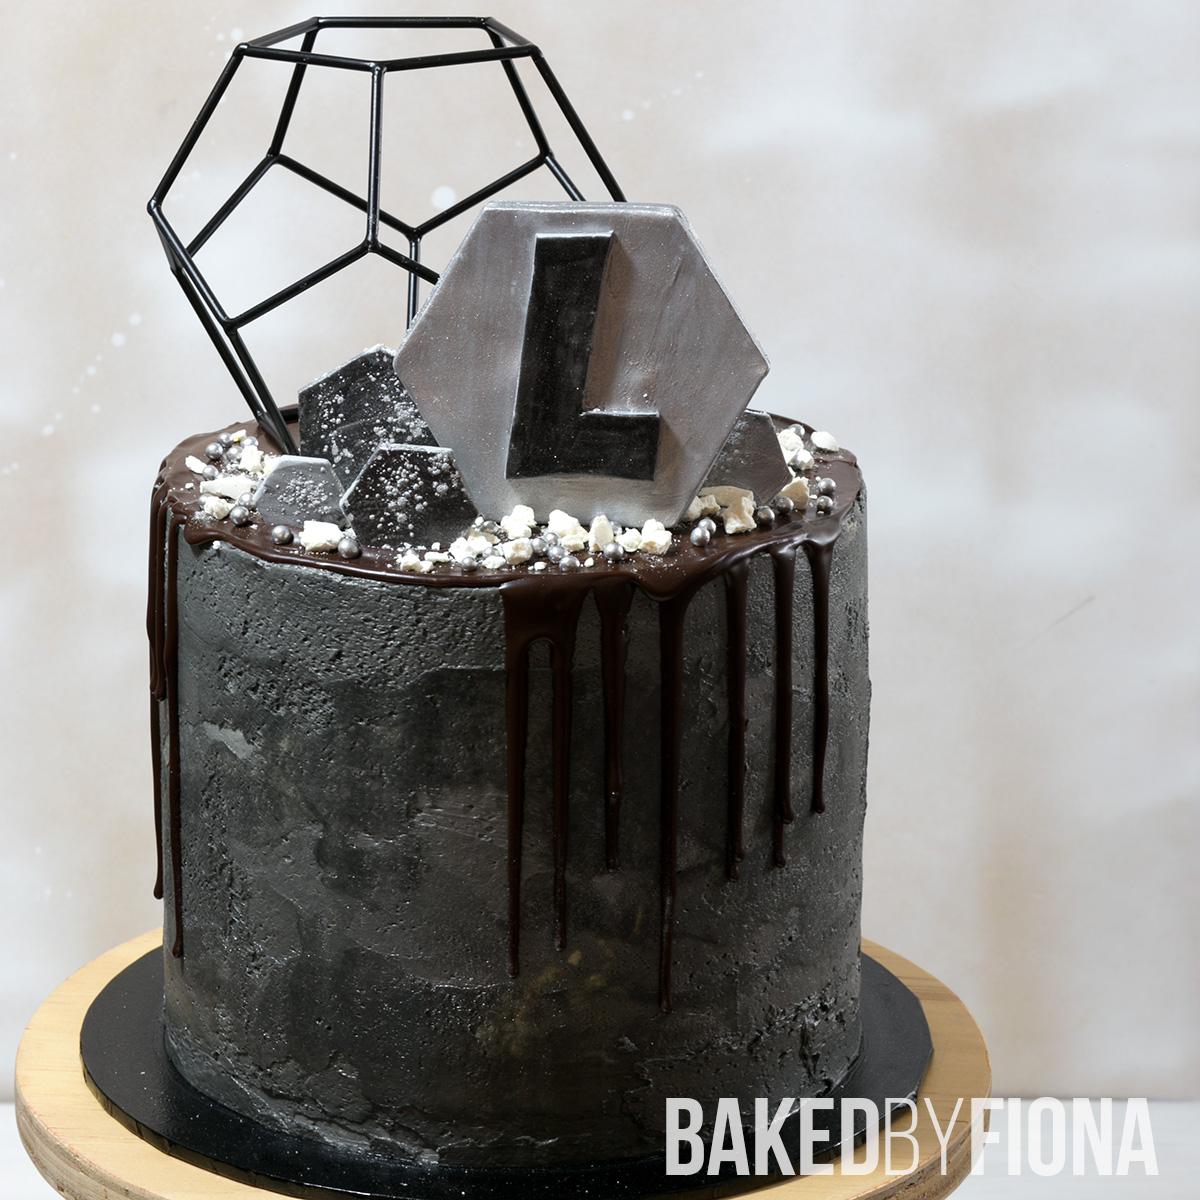 Sydney Cakes, Baked by Fiona 8